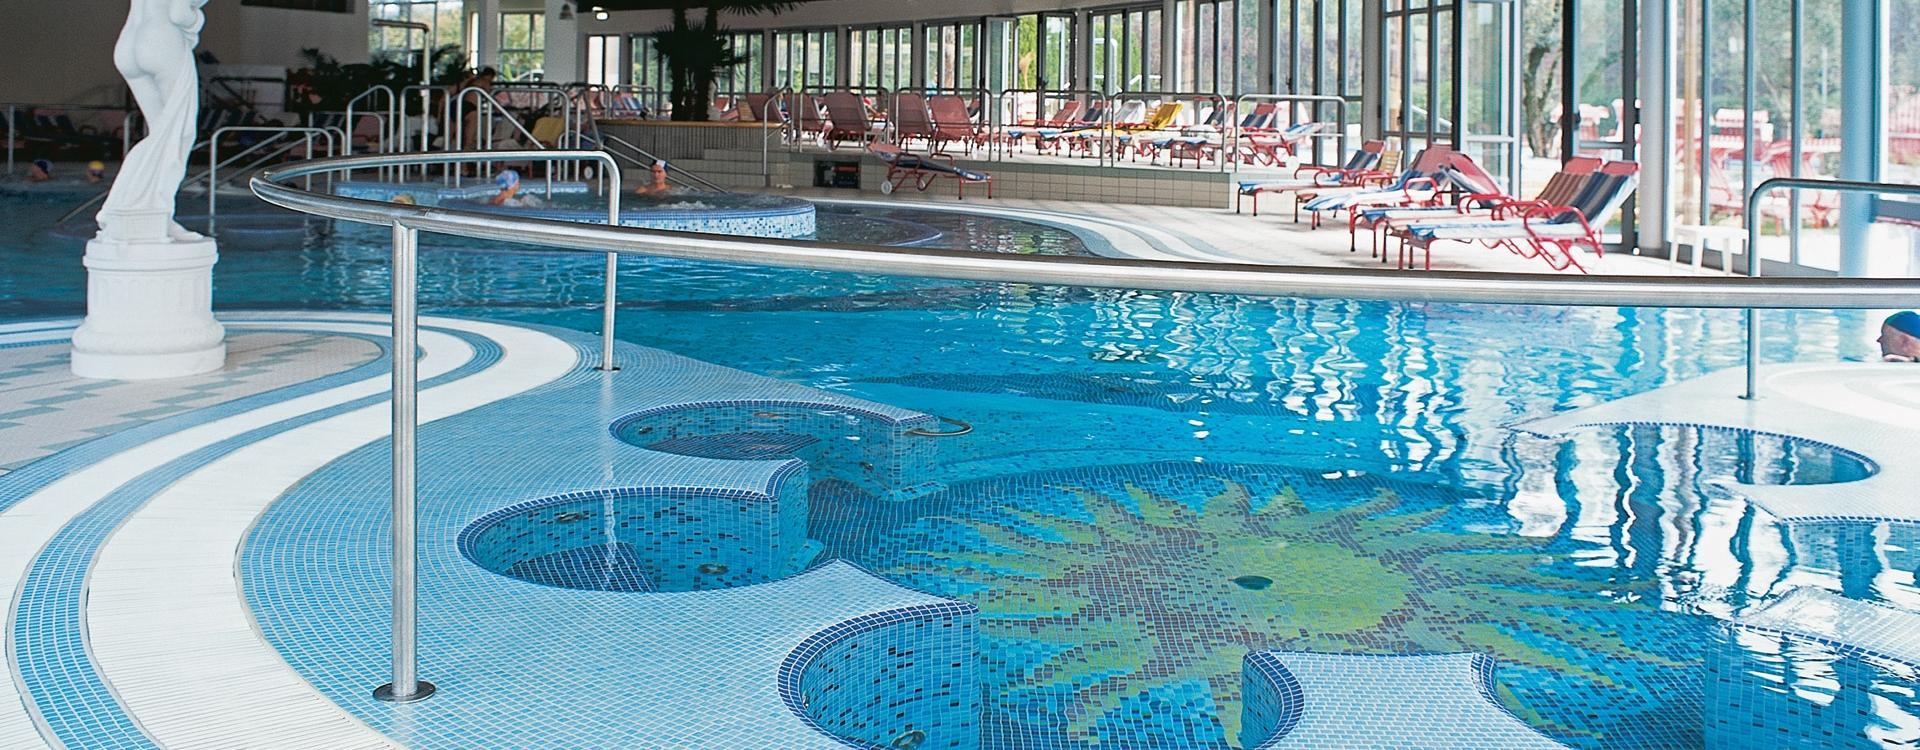 Tiles for hotel petrarca hotel montegrotto terme - Petrarca piscine prezzi ...